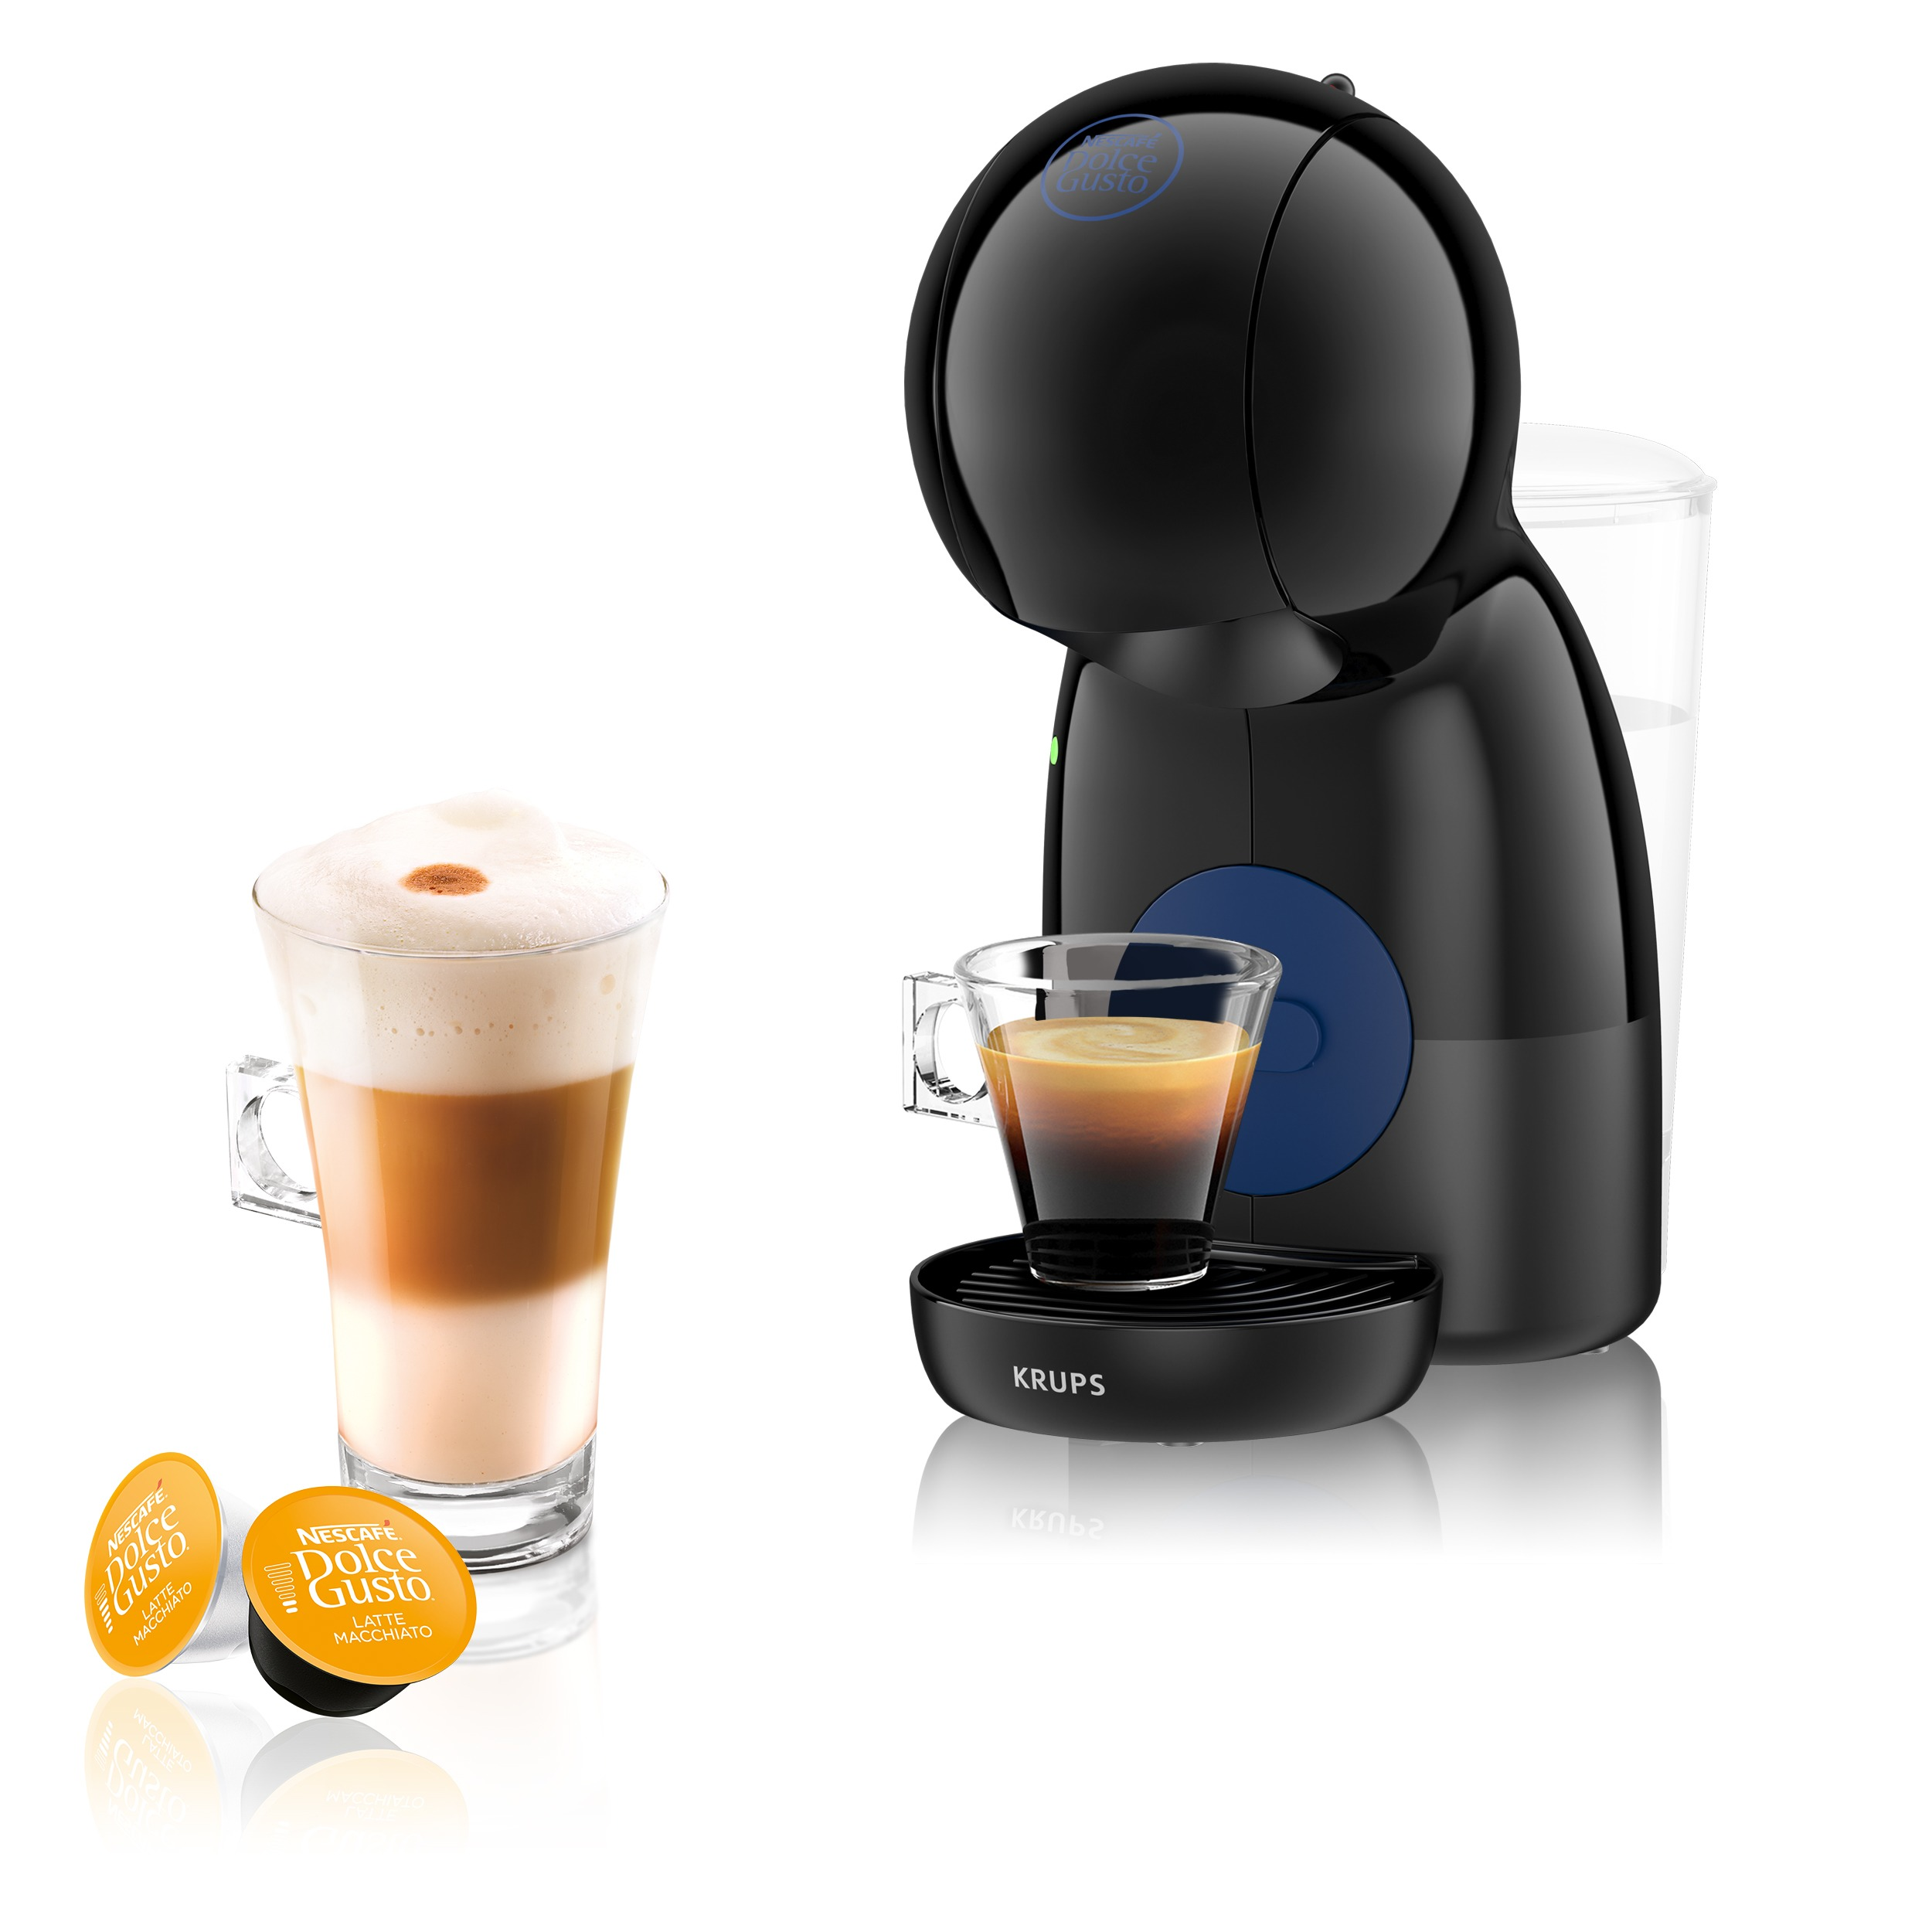 Krups KP1A08 Dolce Gusto Piccolo XS Espresso apparaat Zwart